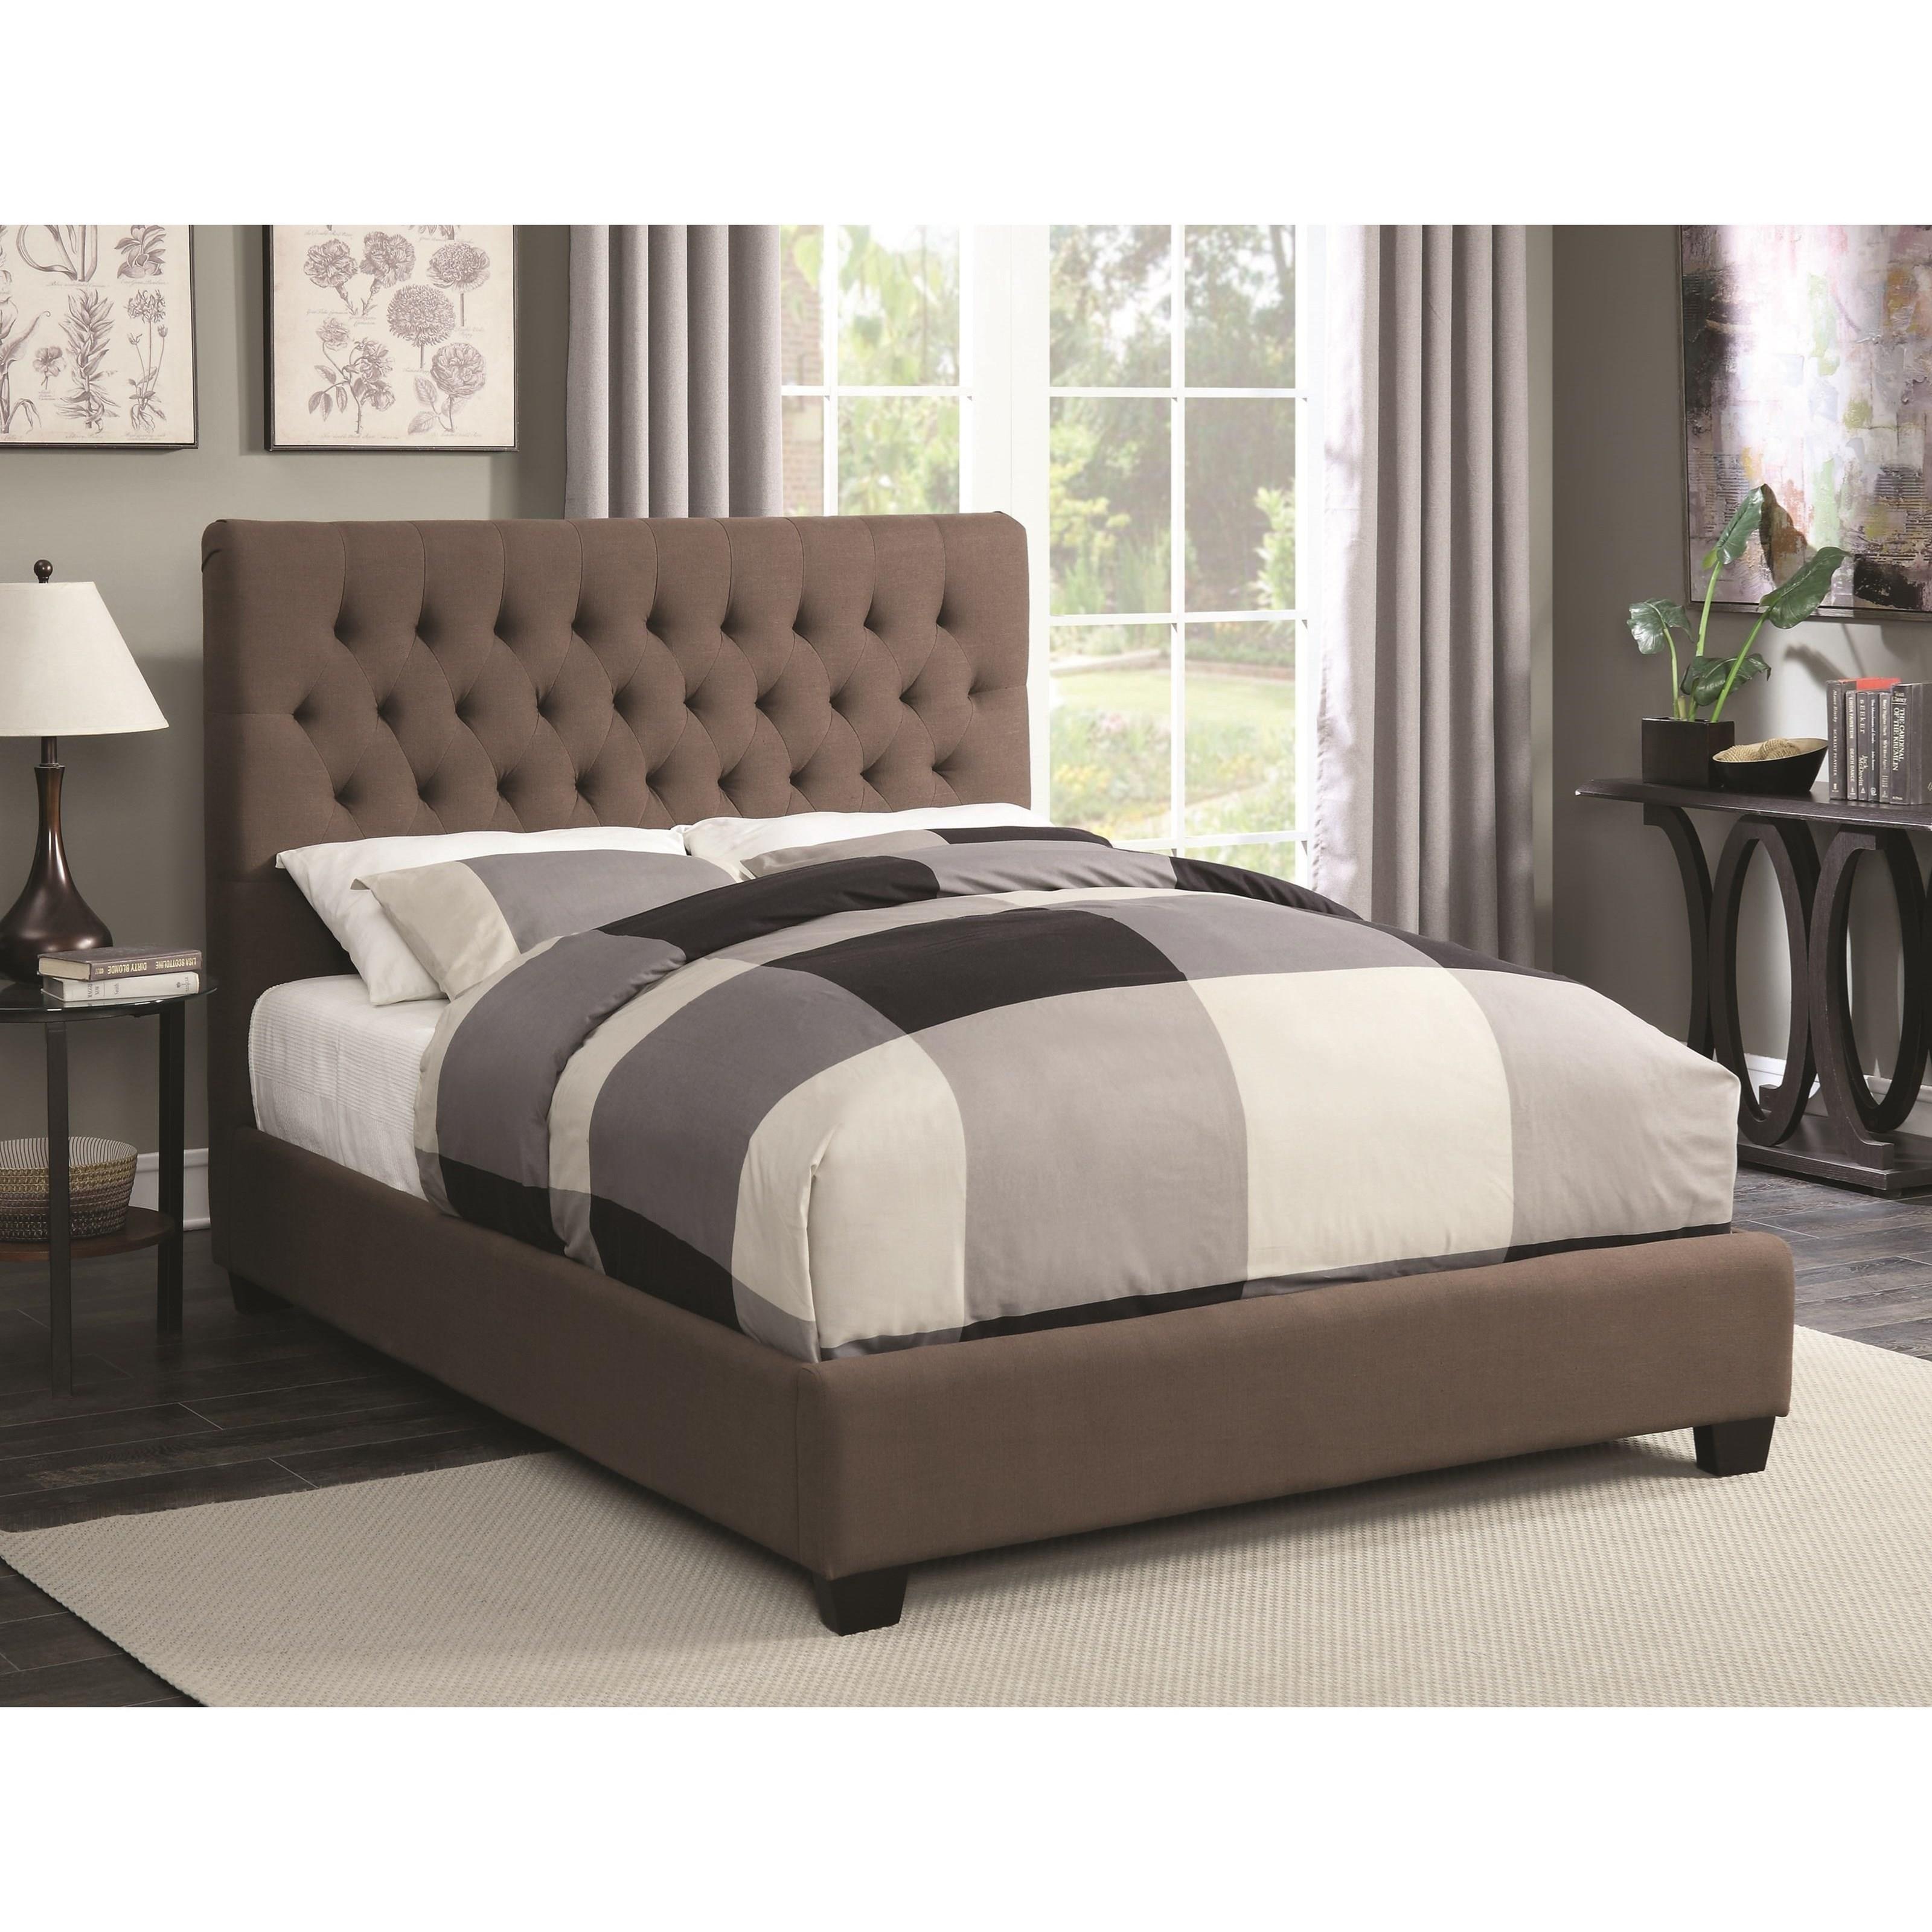 Coaster Upholstered Beds Queen Chloe Upholstered Bed - Item Number: 300530Q